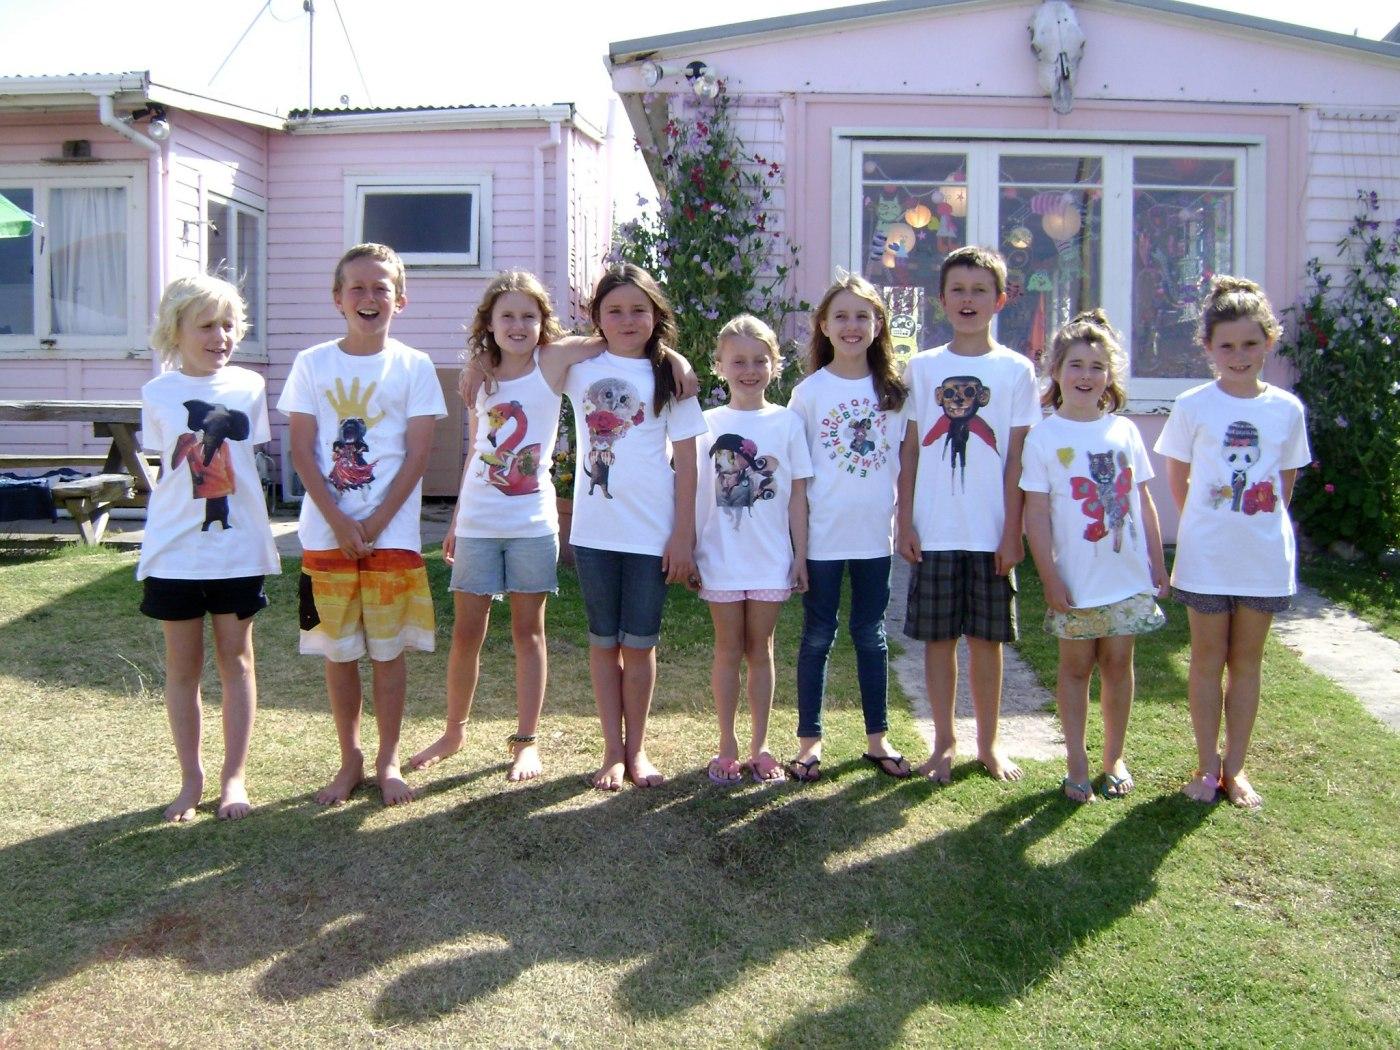 Heidi's kids' art classes - design your own collage t.shirt